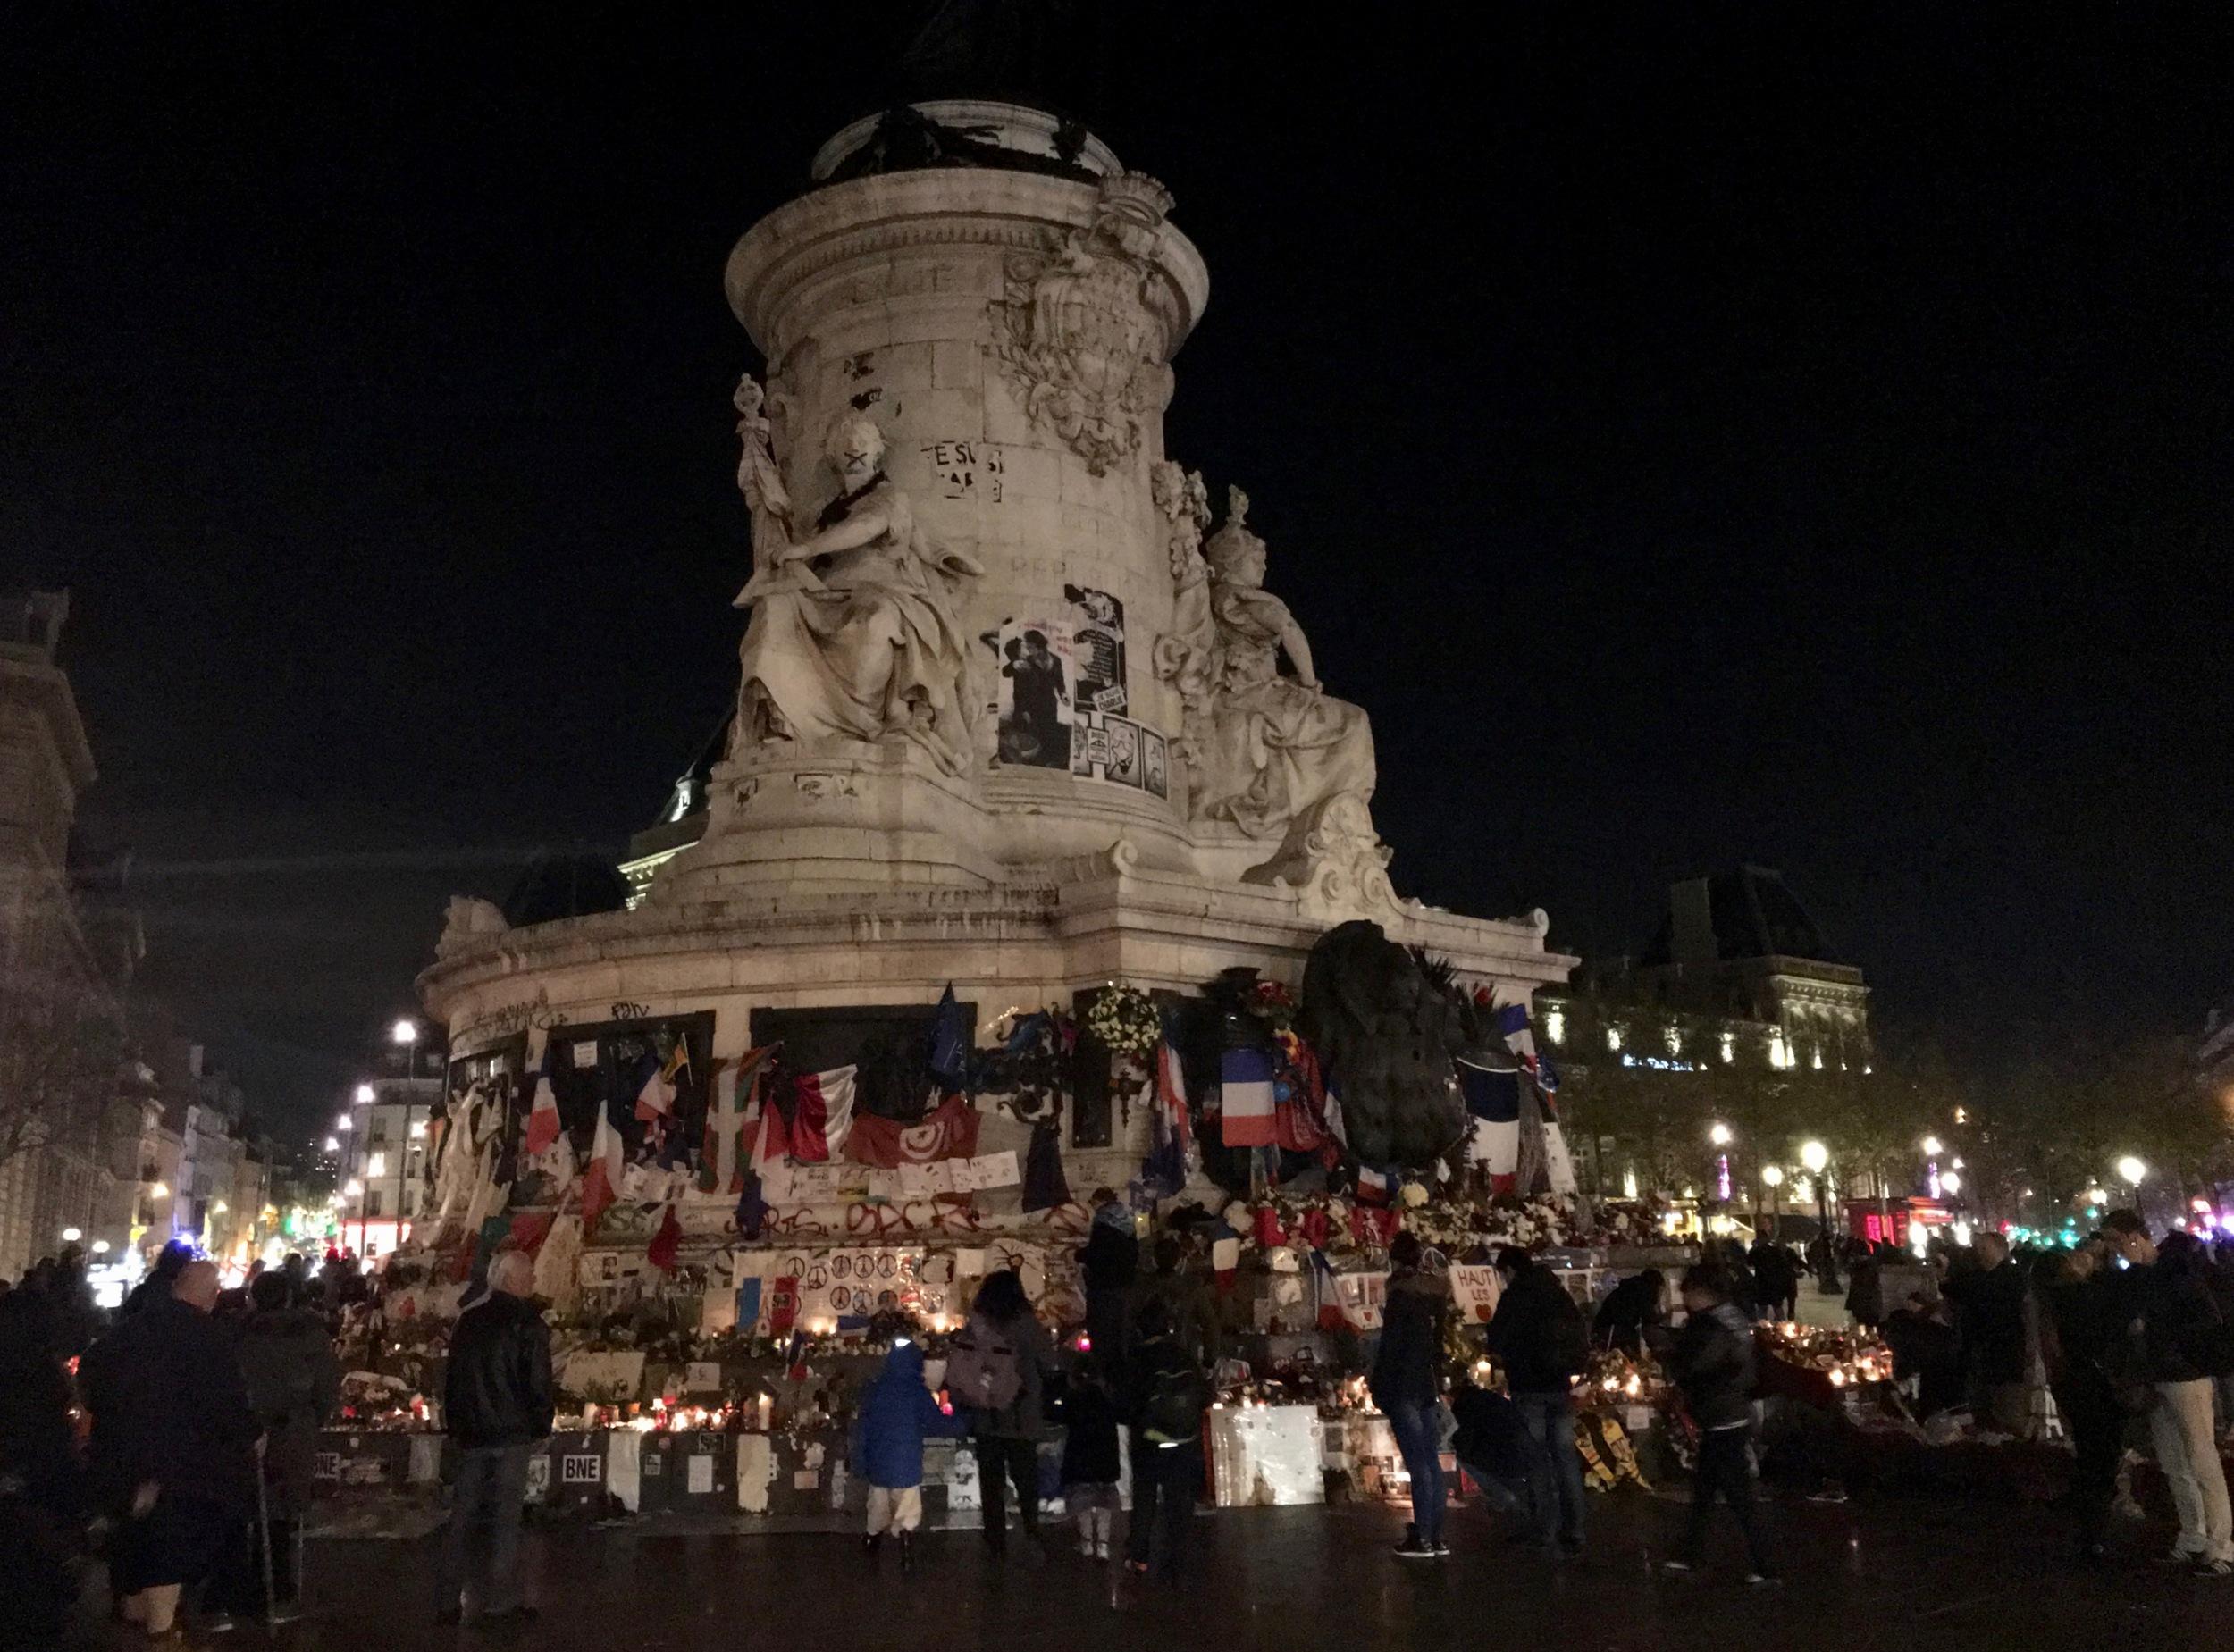 Place de la Republic at night, December, 2015